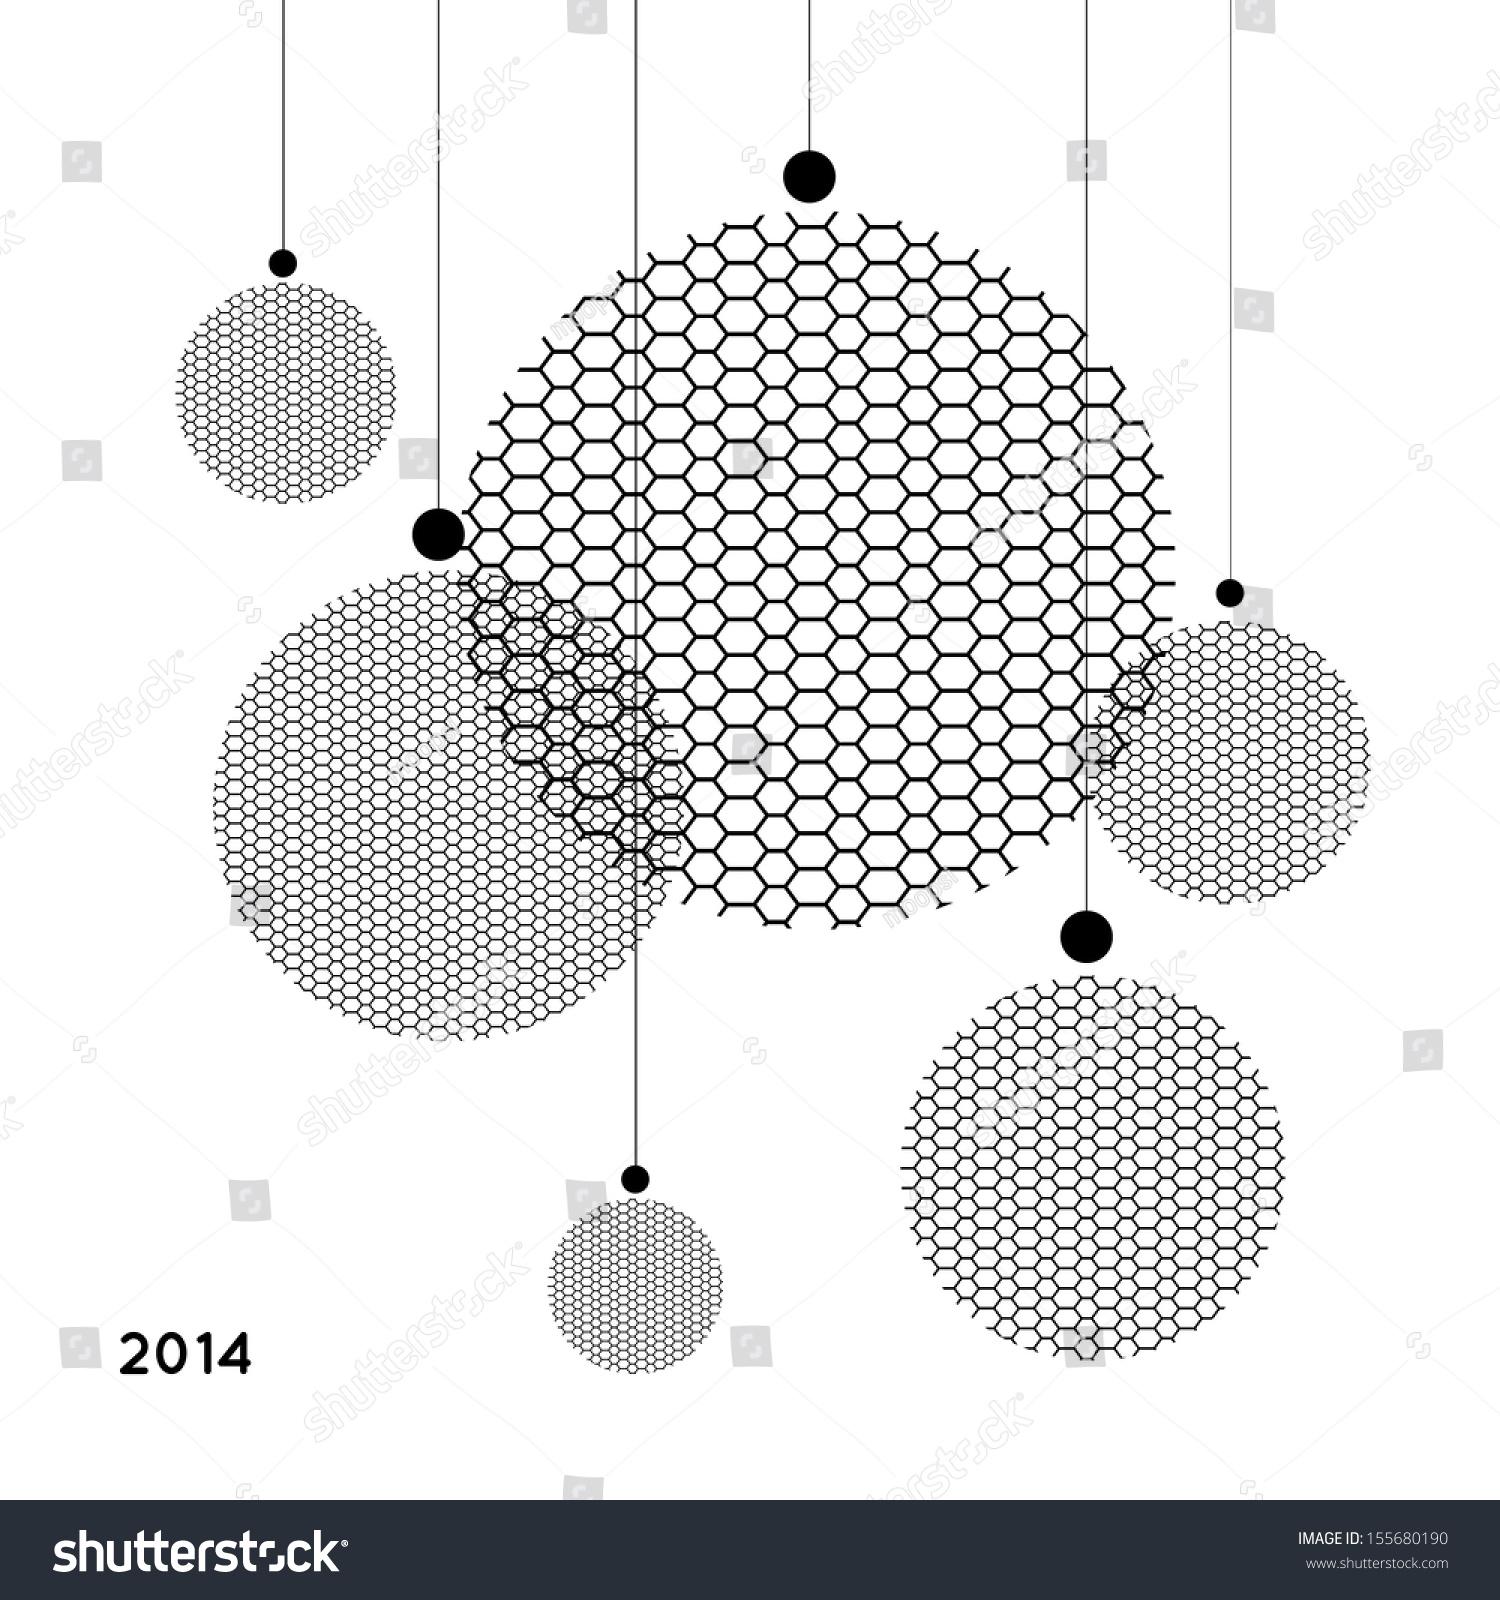 Christmas minimalist balls greeting card 2014 stock vector for Minimalist christmas